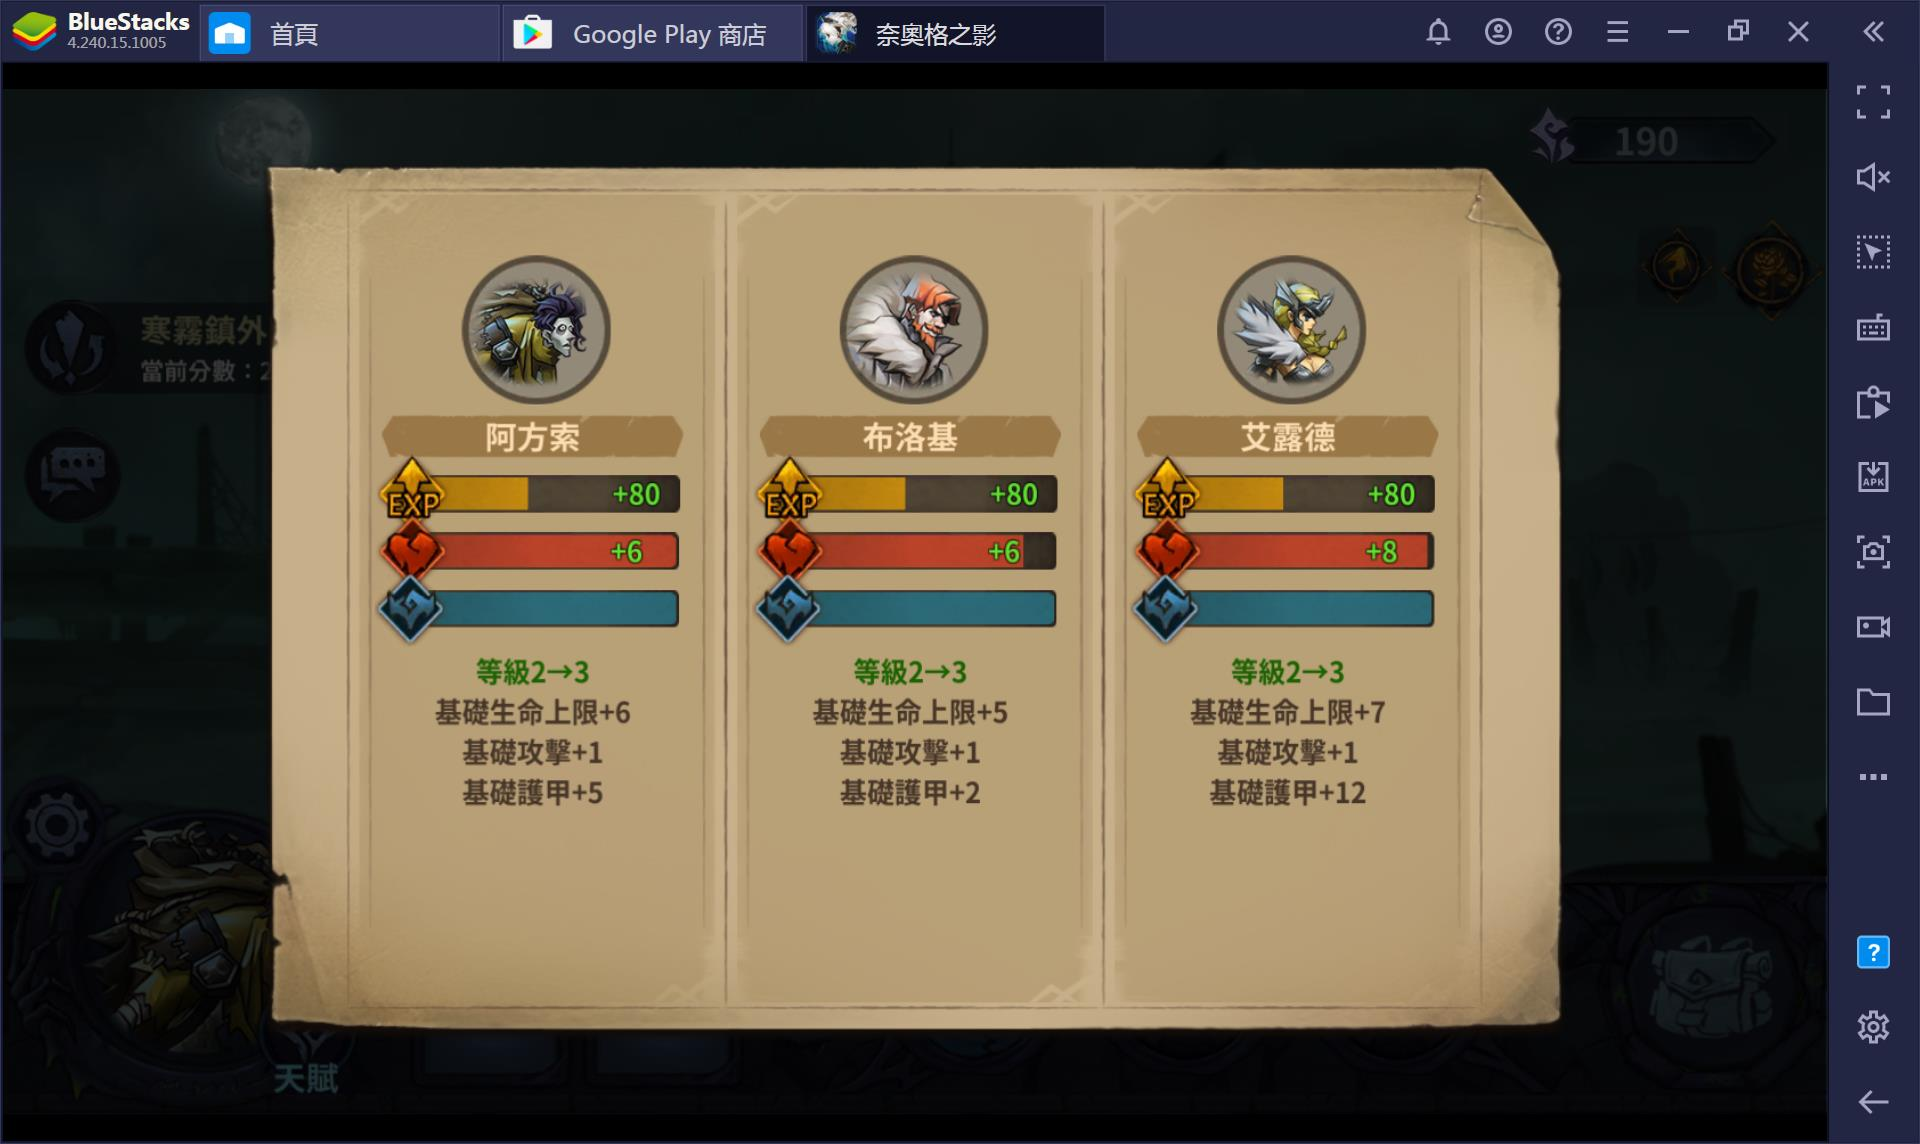 Roguelike回合制遊戲《奈奧格之影》已開放搶先體驗!